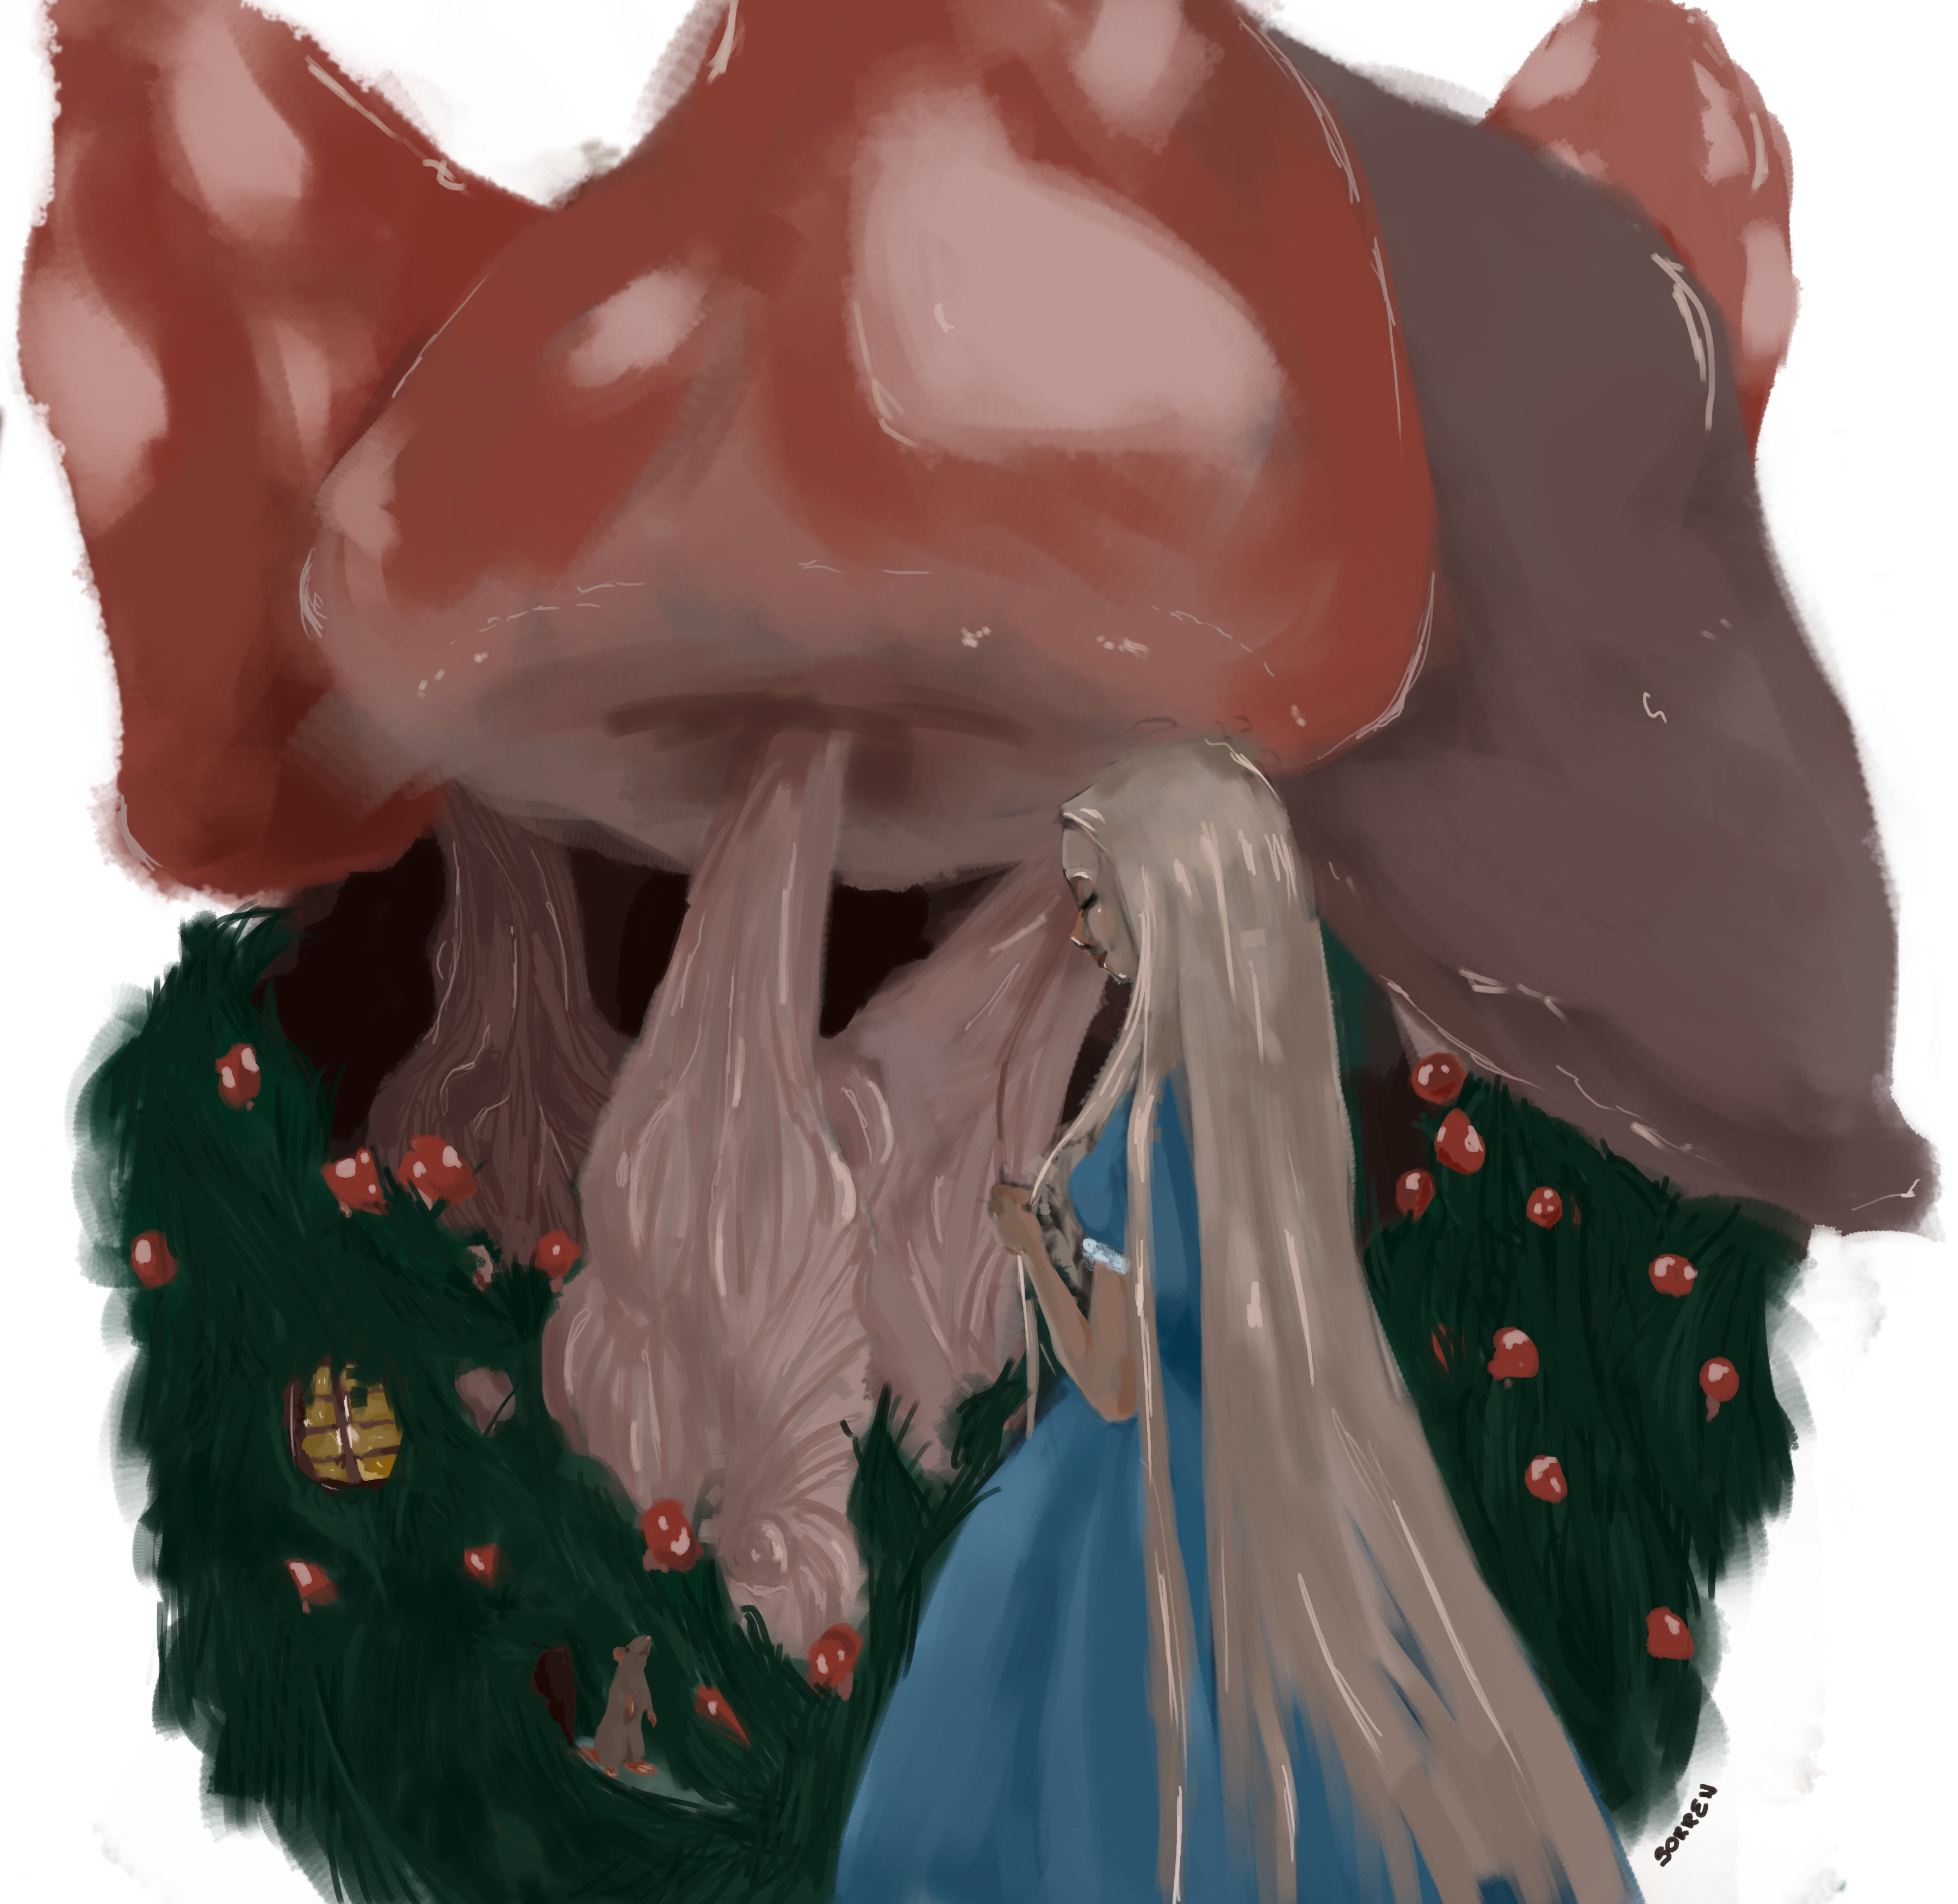 Mice and mushrooms